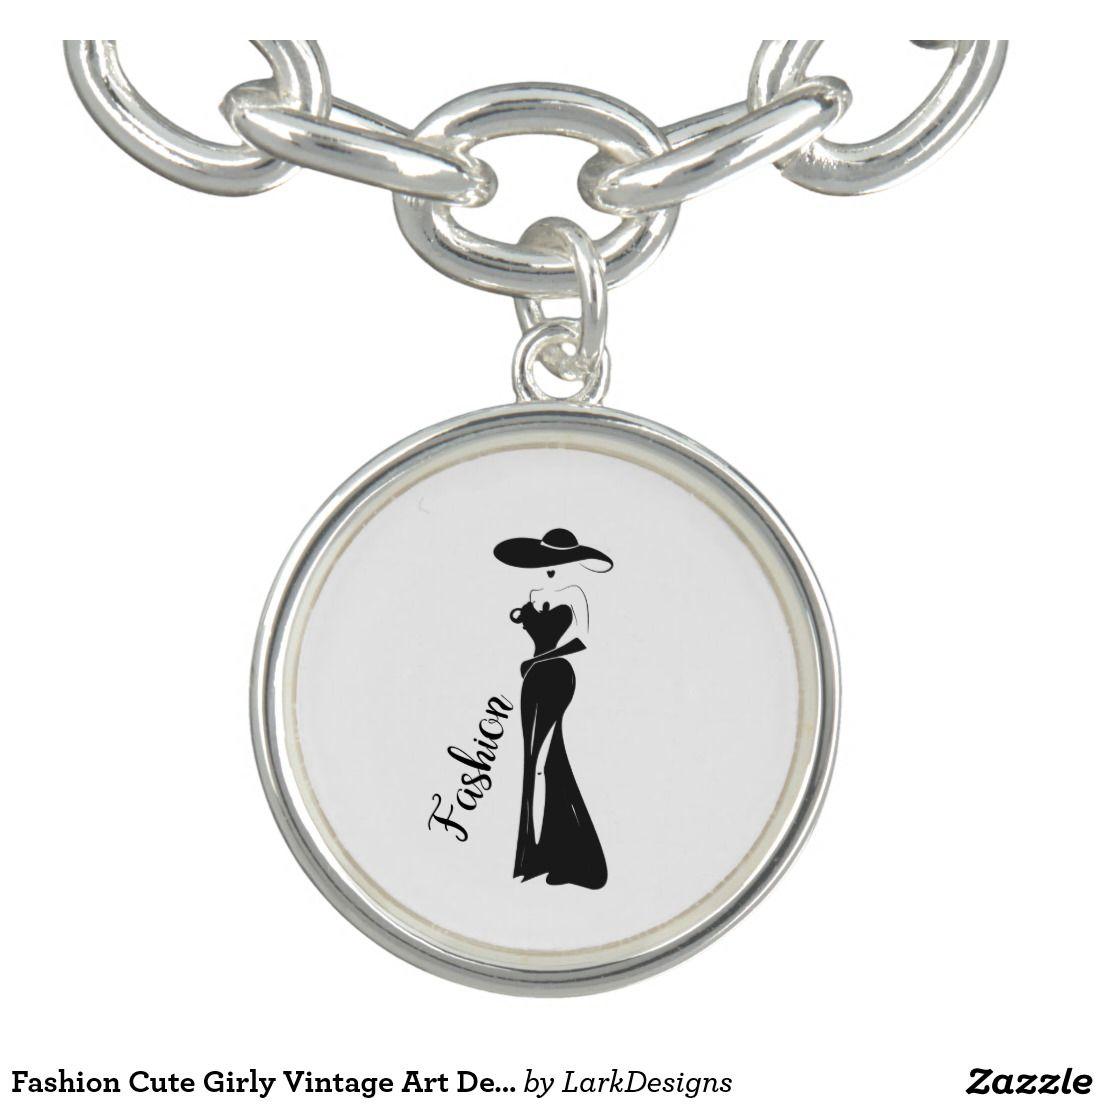 Fashion cute girly vintage art deco design charm bracelet lark